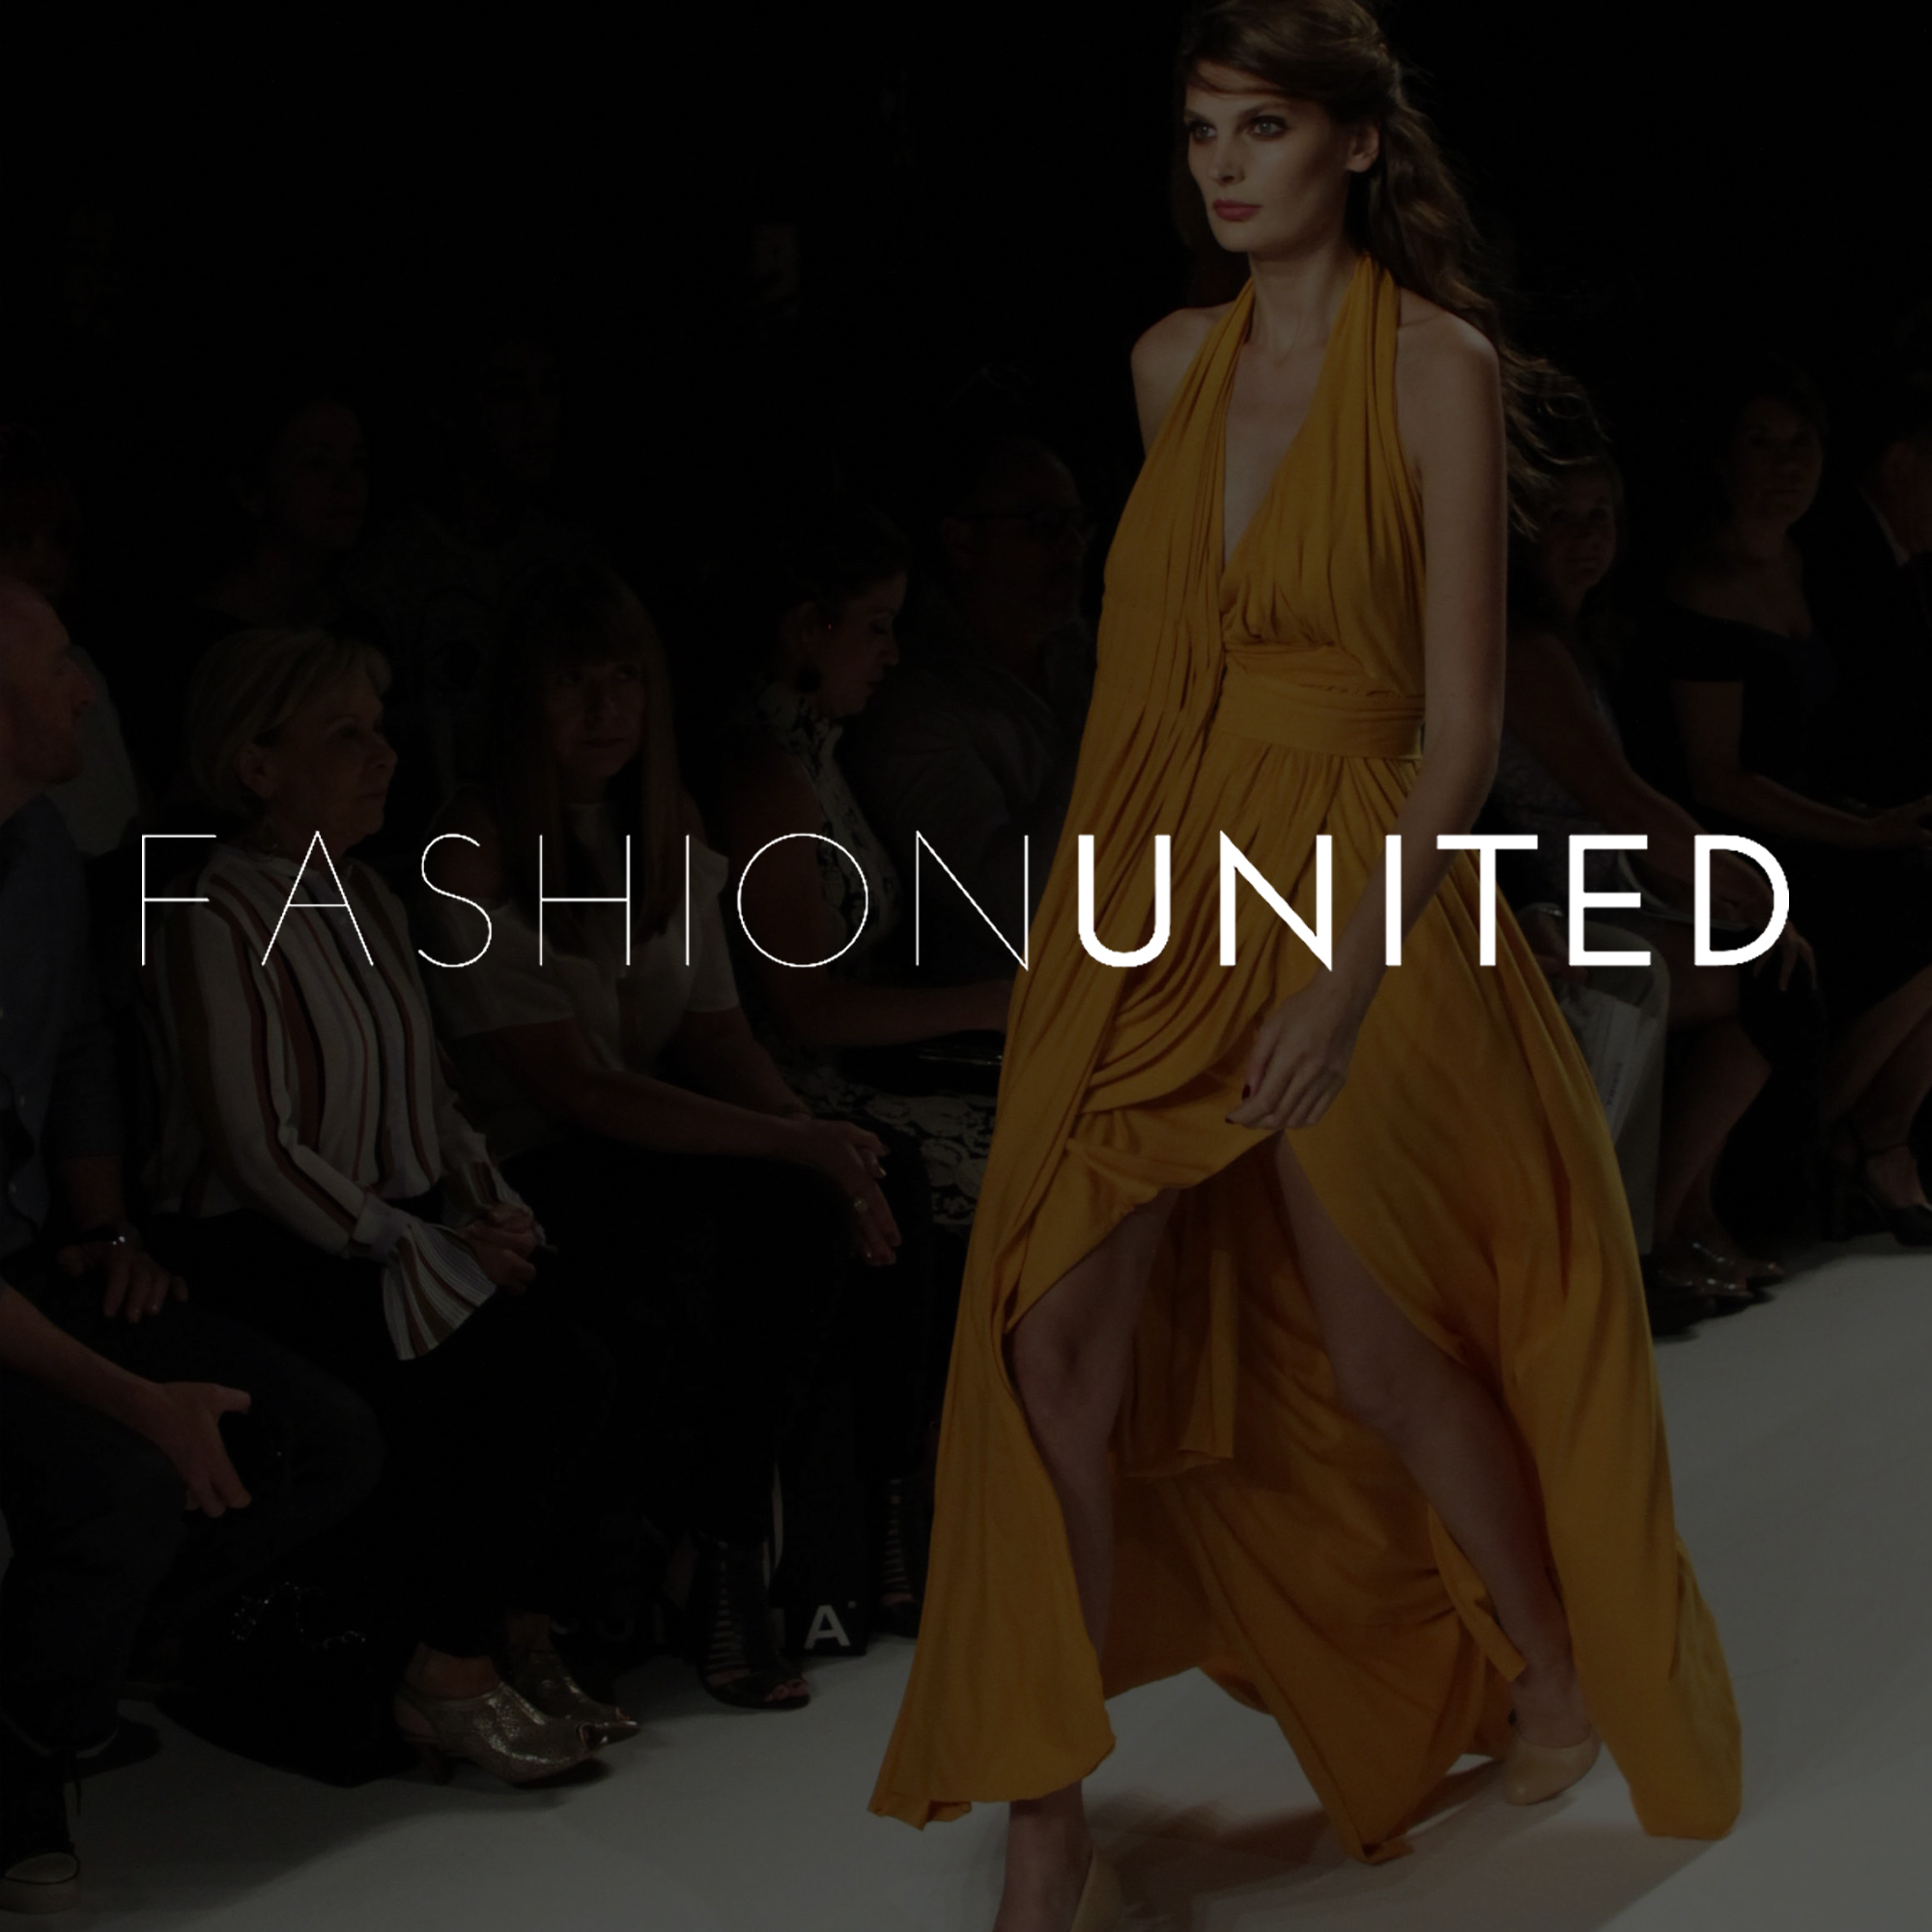 Fashion-United-Press-Simple.jpg